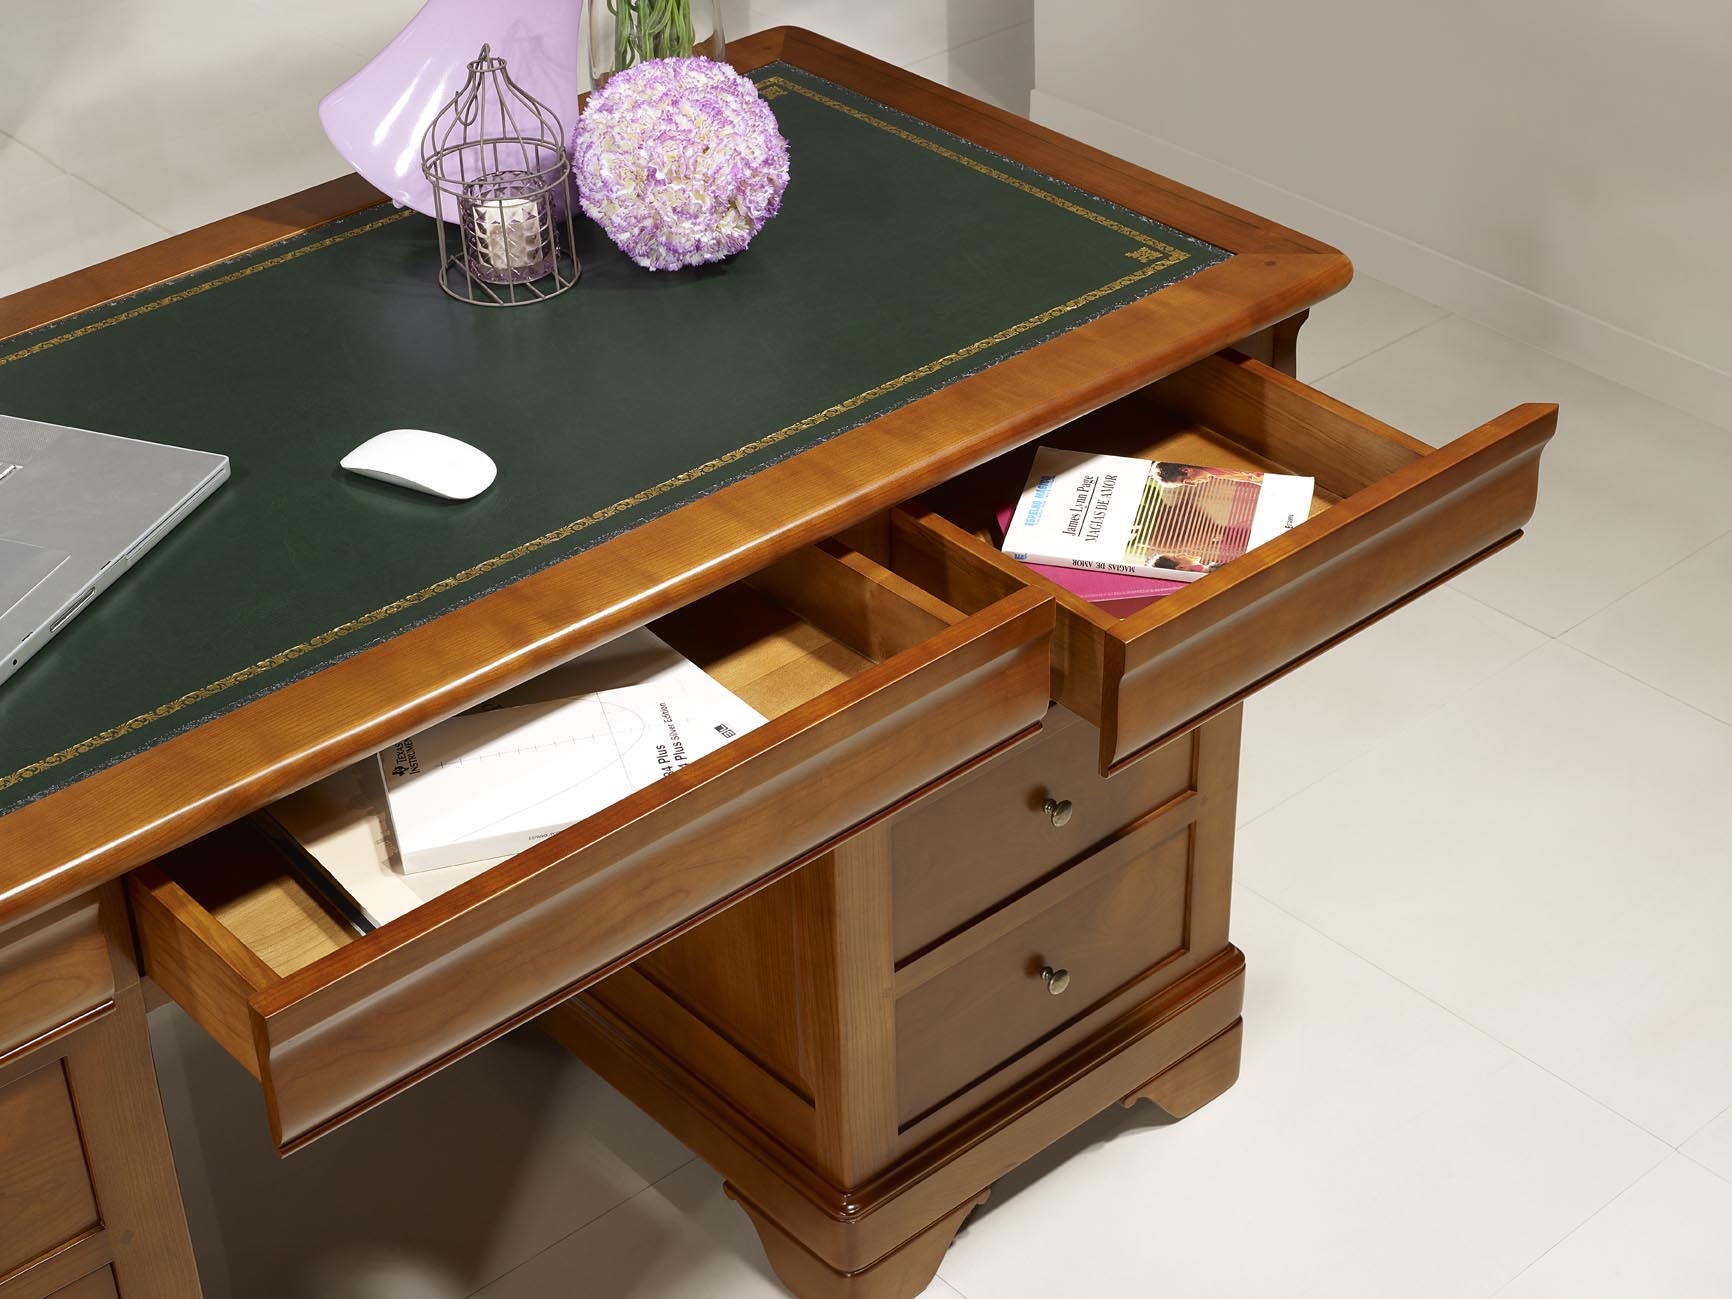 bureau ministre 9 tiroirs en merisier massif de style louis philippe meuble en merisier massif. Black Bedroom Furniture Sets. Home Design Ideas